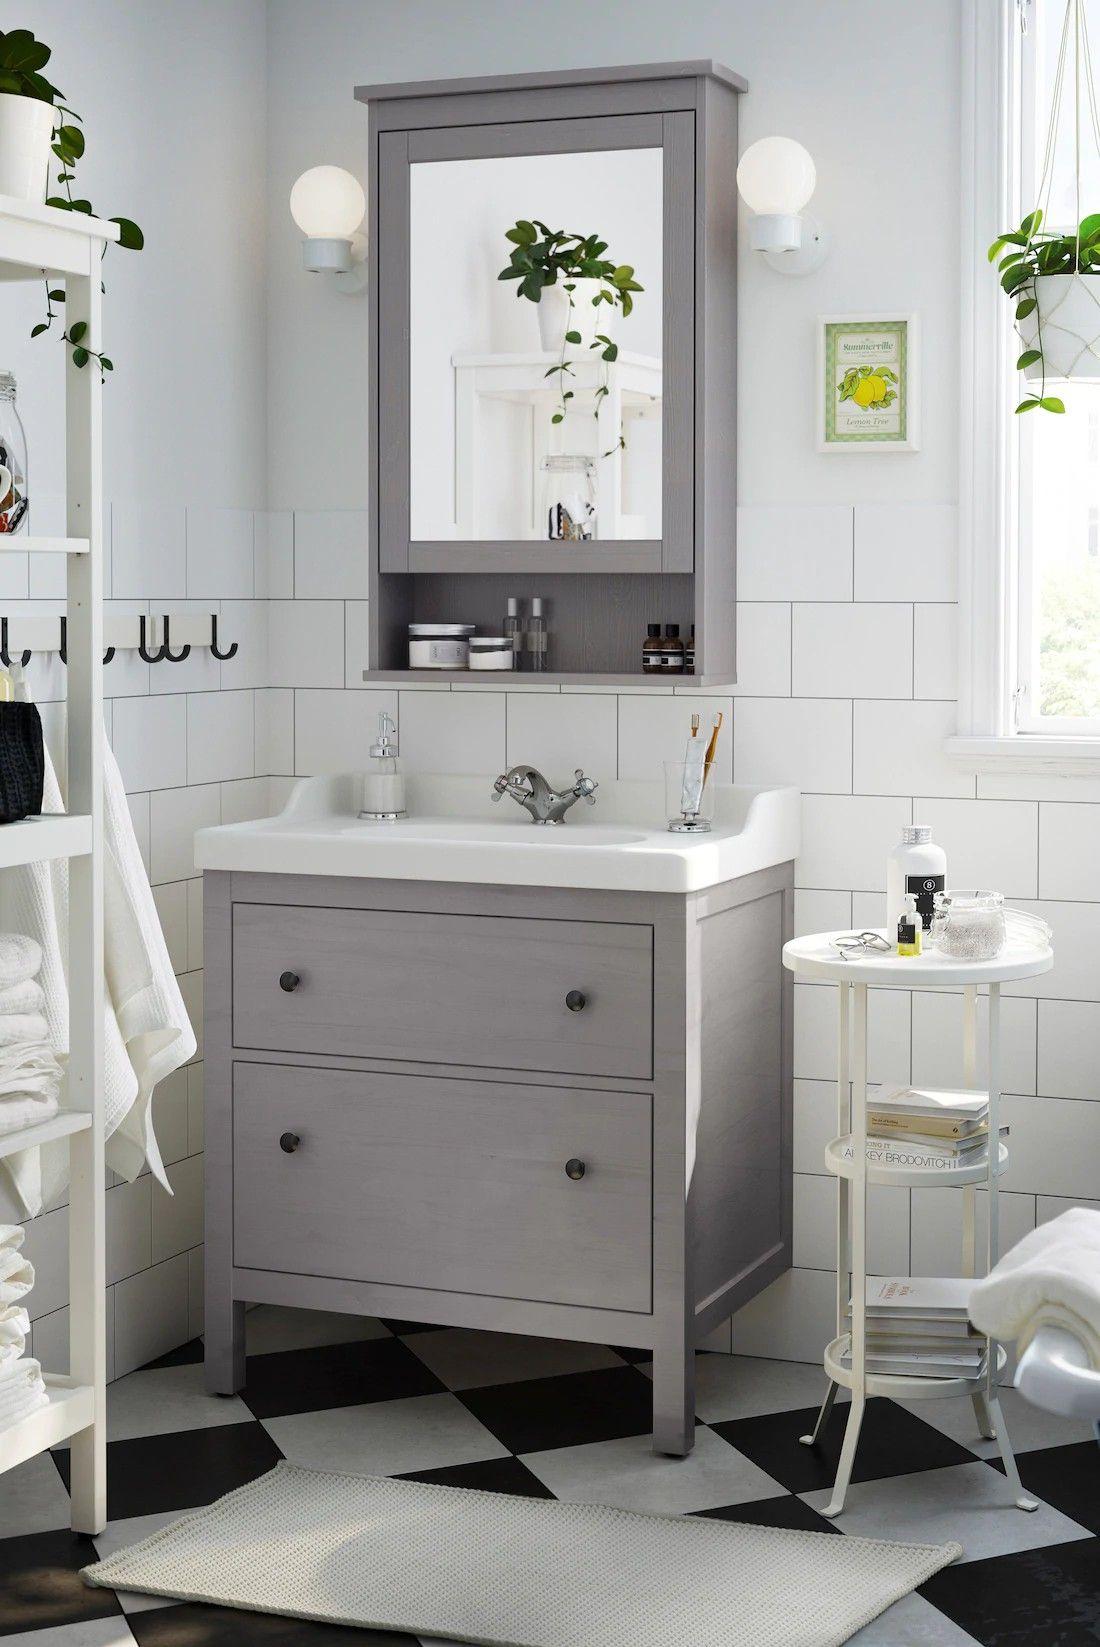 Pin By Ulrike Hippauf On Ideen Fur Die Wohnung Ikea Bathroom Vanity Bathroom Interior Home Decor Hooks